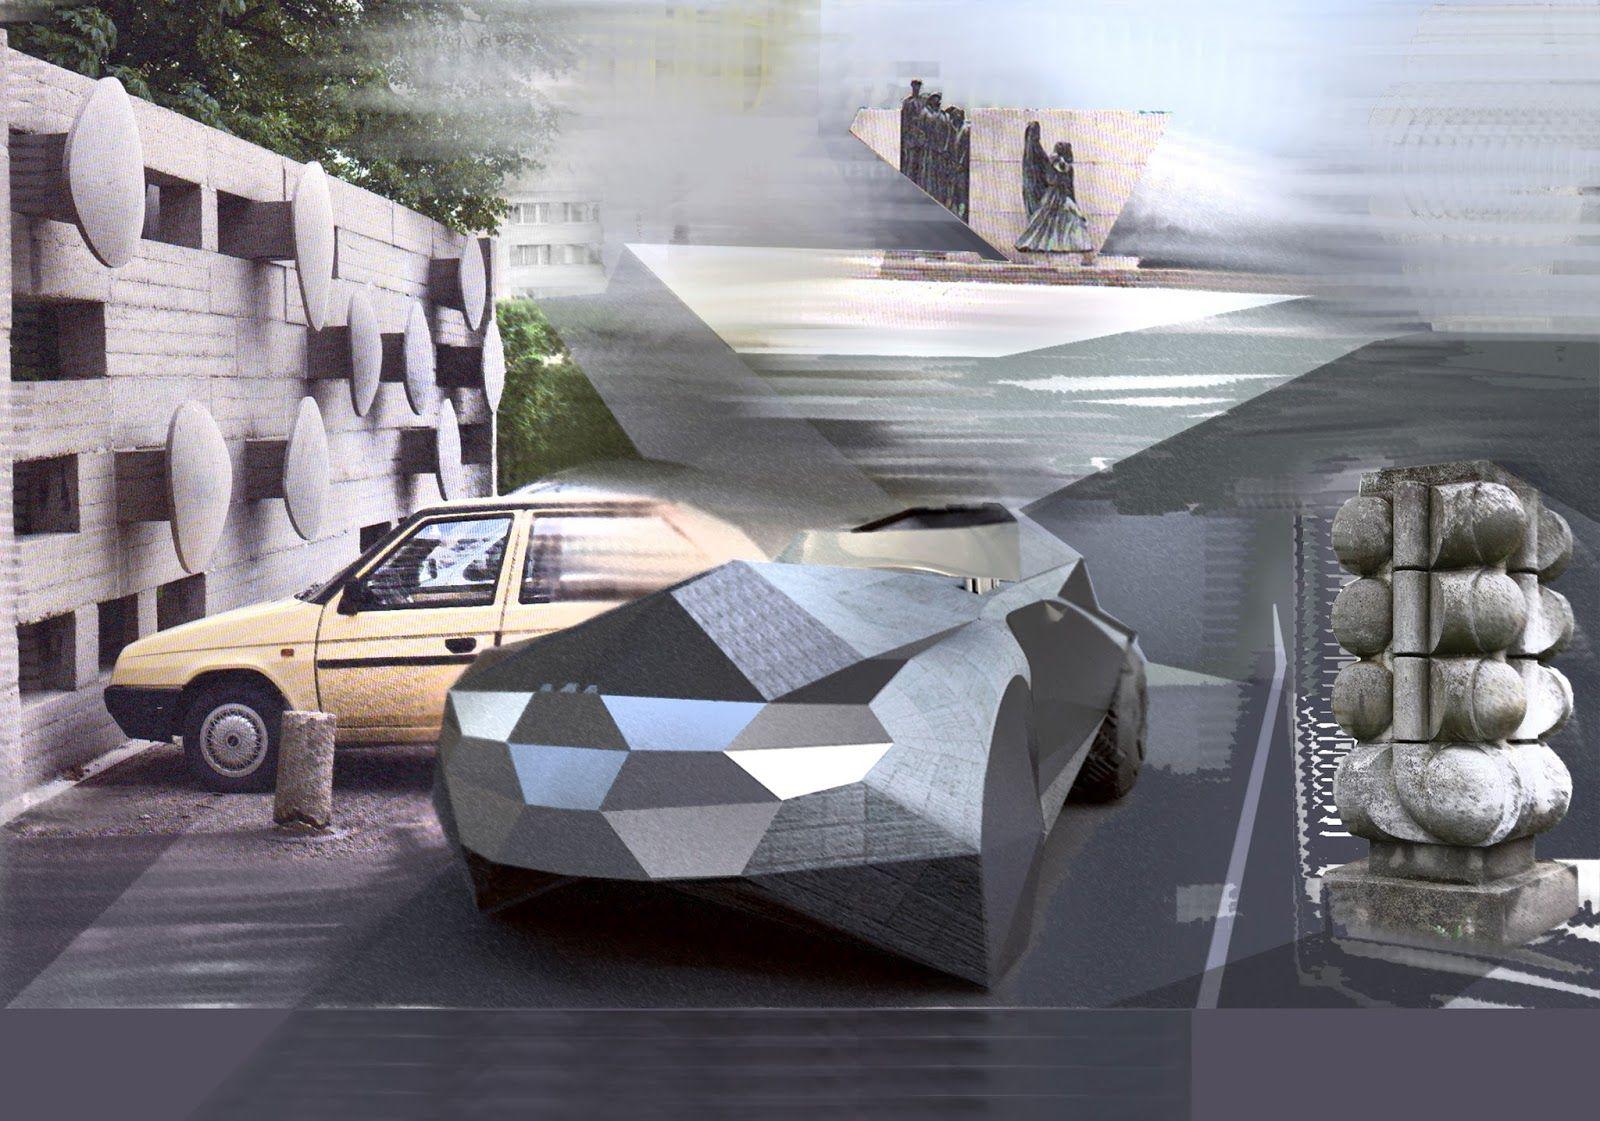 Audi Slovan- Martin Tittel- VŠVU Bratislava #AudiUniverse2016 #MyIdentity #strataIdentity #FolkCar #AudiPreVýchodnéTrhy #AudiOst #AudiNewIdentity